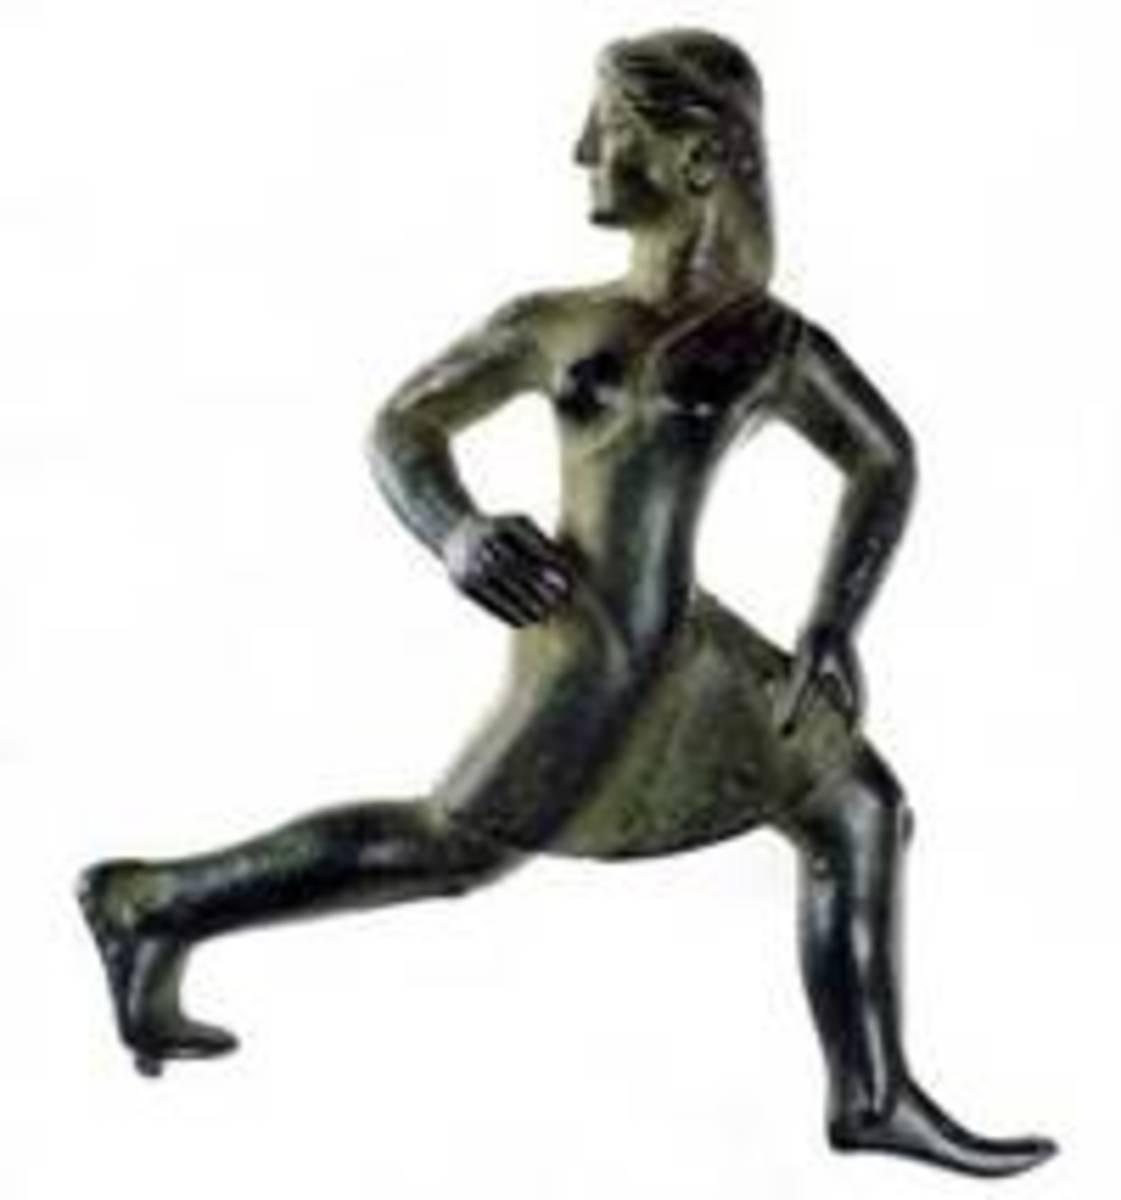 Spartan maiden running a foot-race, c. 520 BC